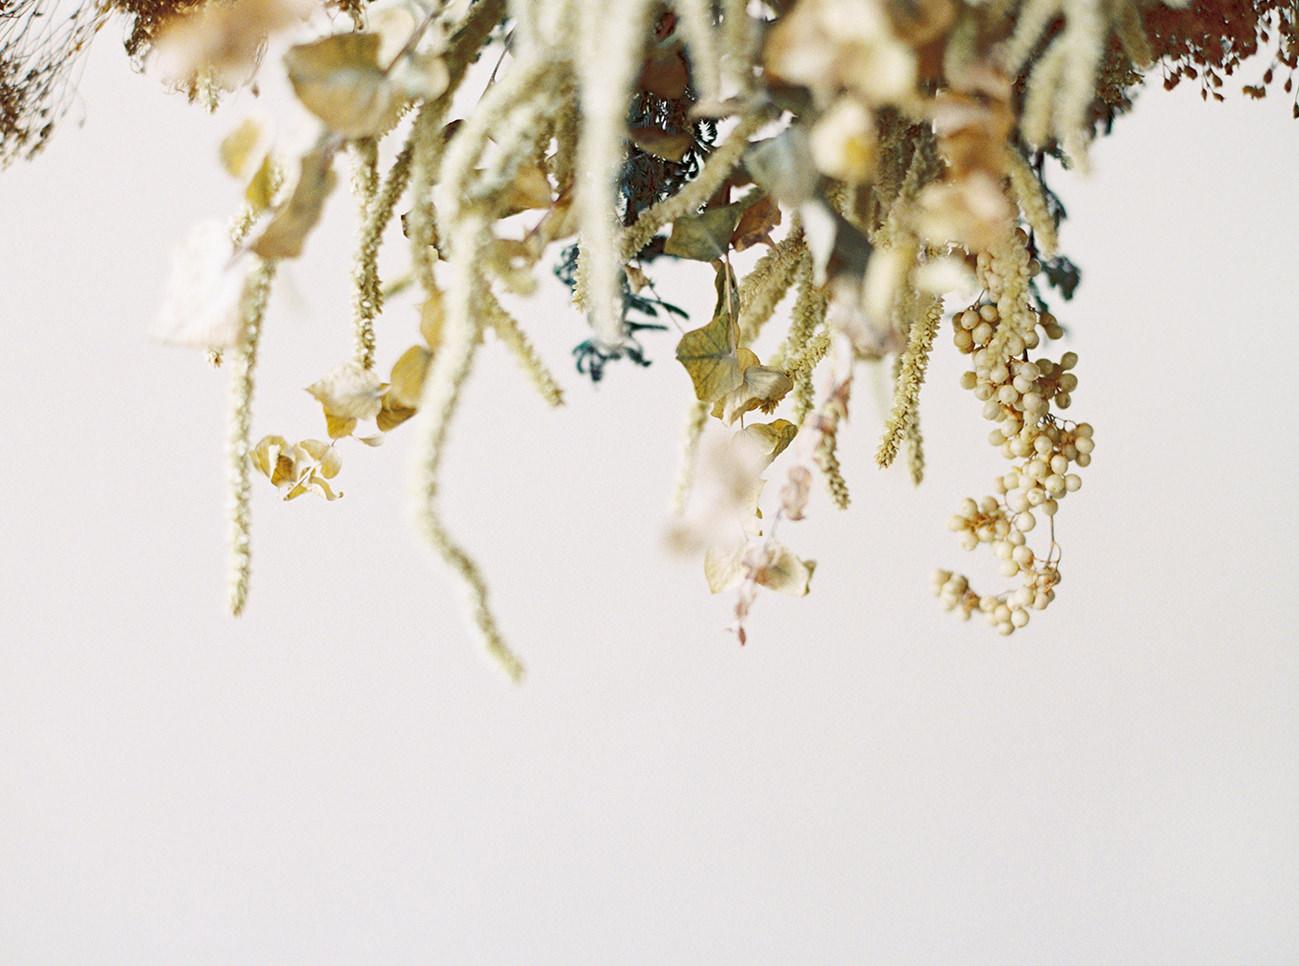 Bridal Inspiration, Wedding Bouquet, Hääkuvaus, Film Wedding Photographer, Table Setting Inspiration, Stationery, Dried Flowers, www.nordandmae.com, www.susannanordvall (24).jpg